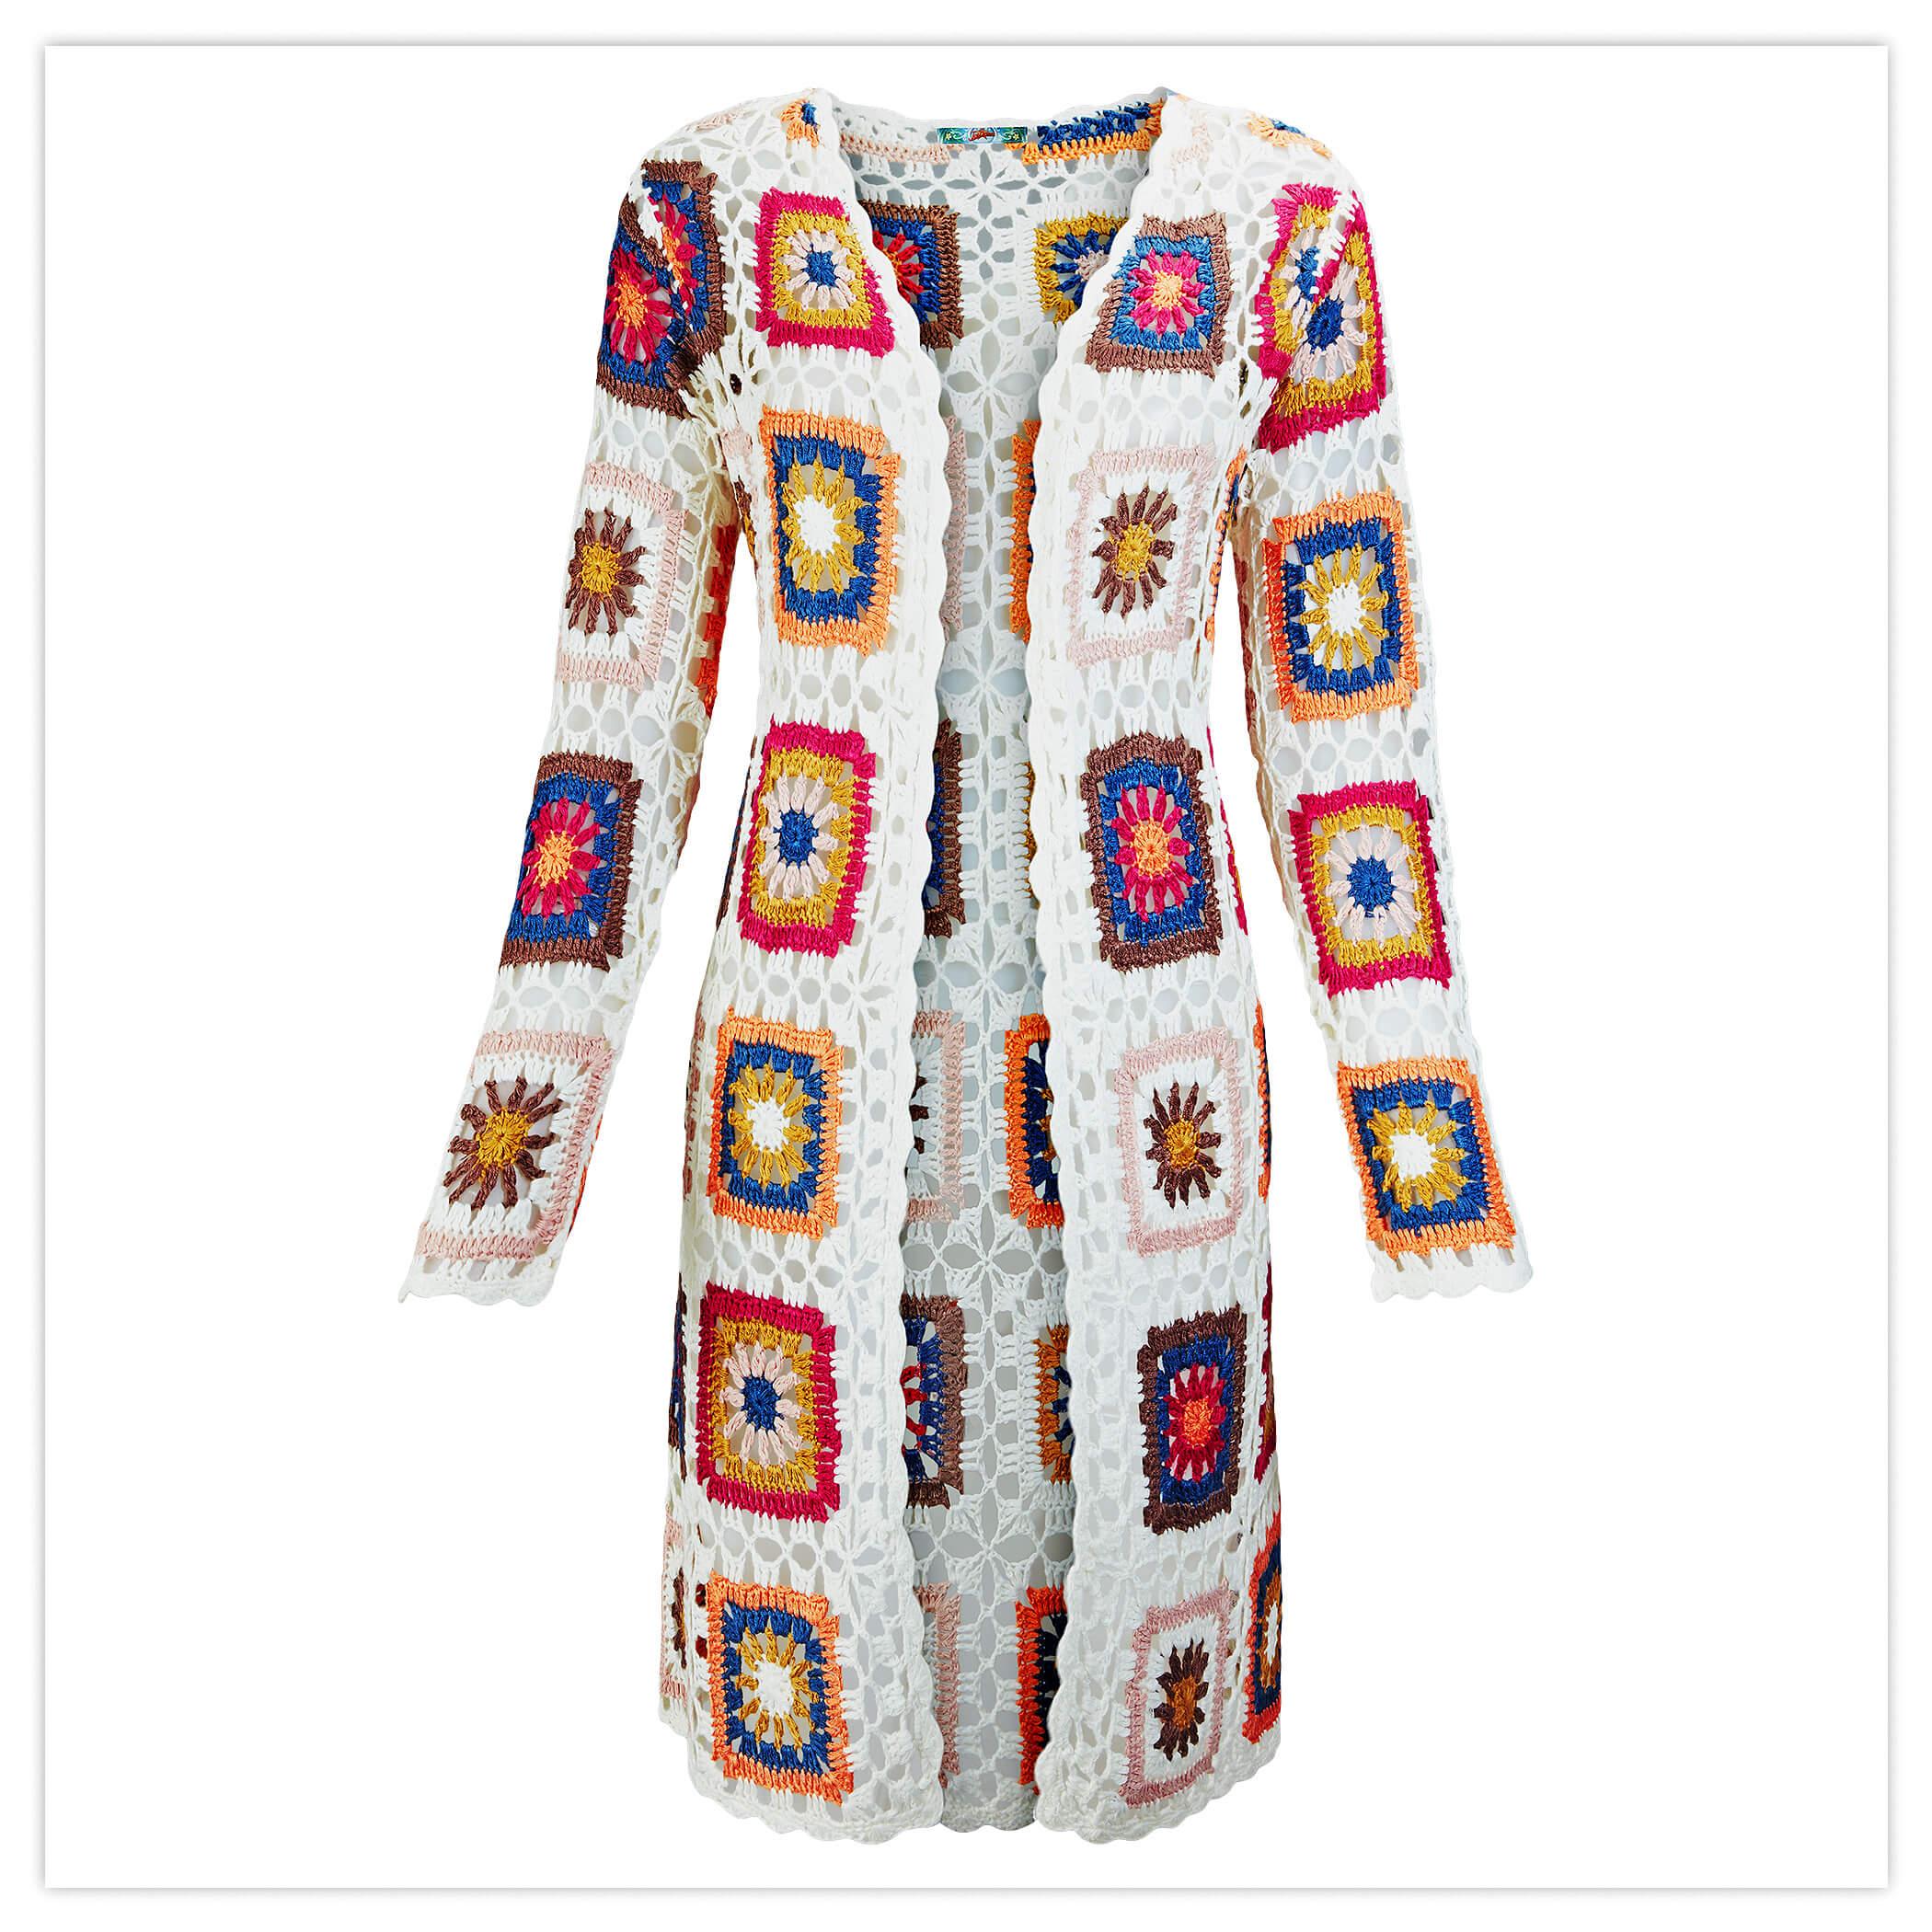 Quirly Crochet Longline Cardigan